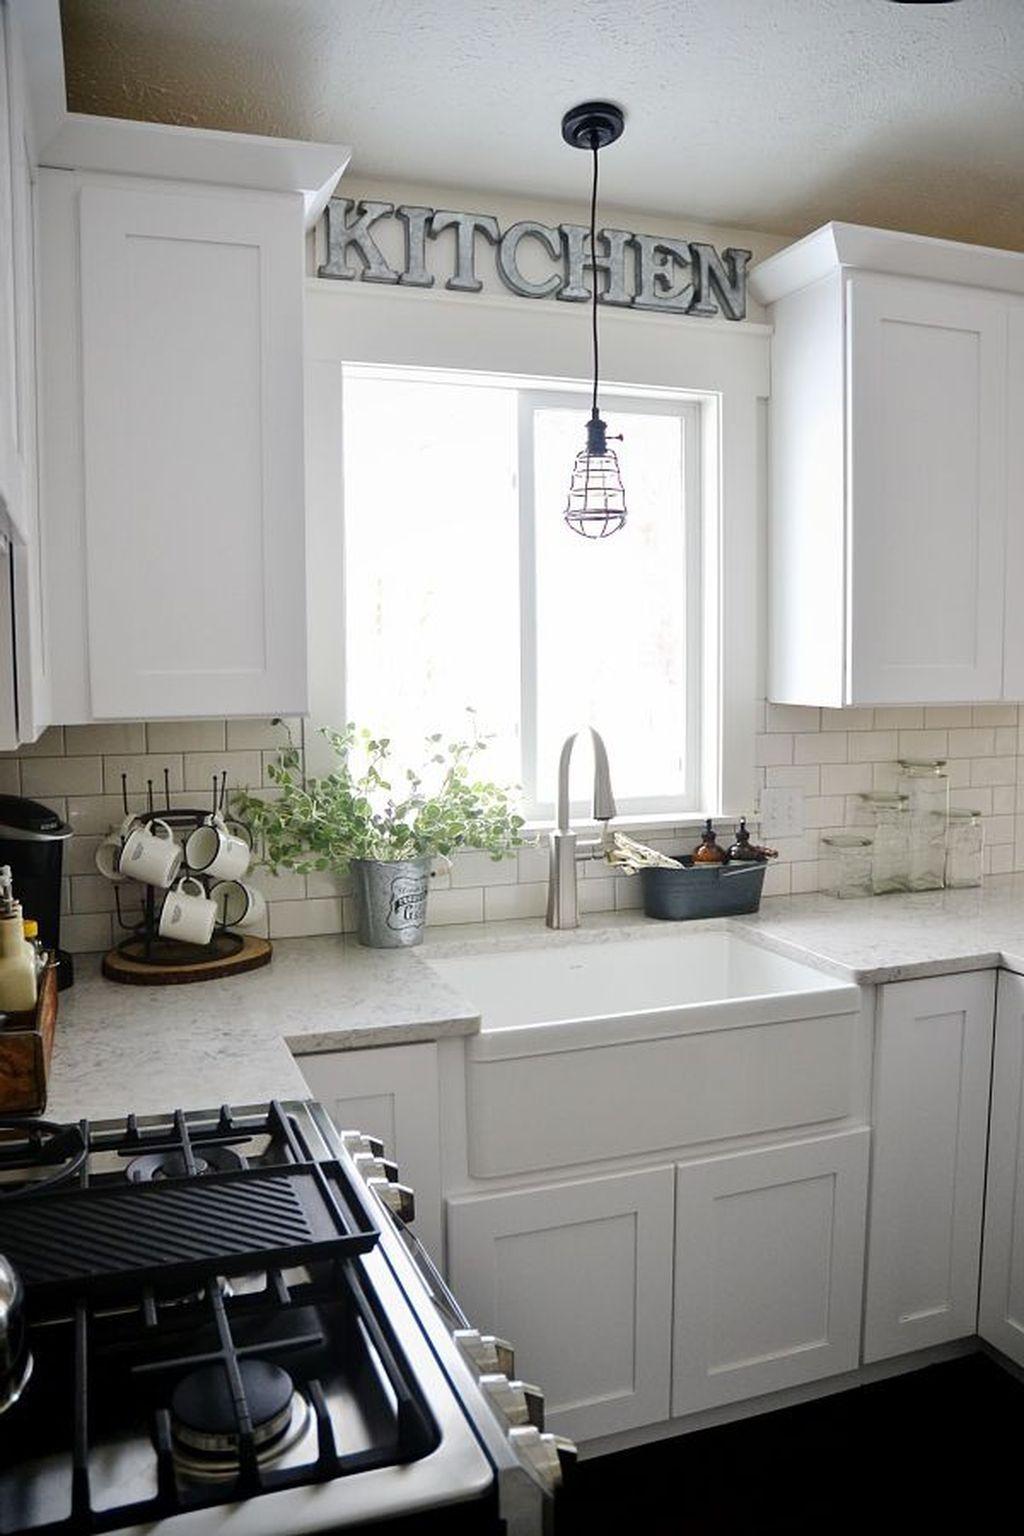 22 Unique Diy Kitchen Island Ideas: 30+ Unique Farmhouse Lighting Kitchen Ideas